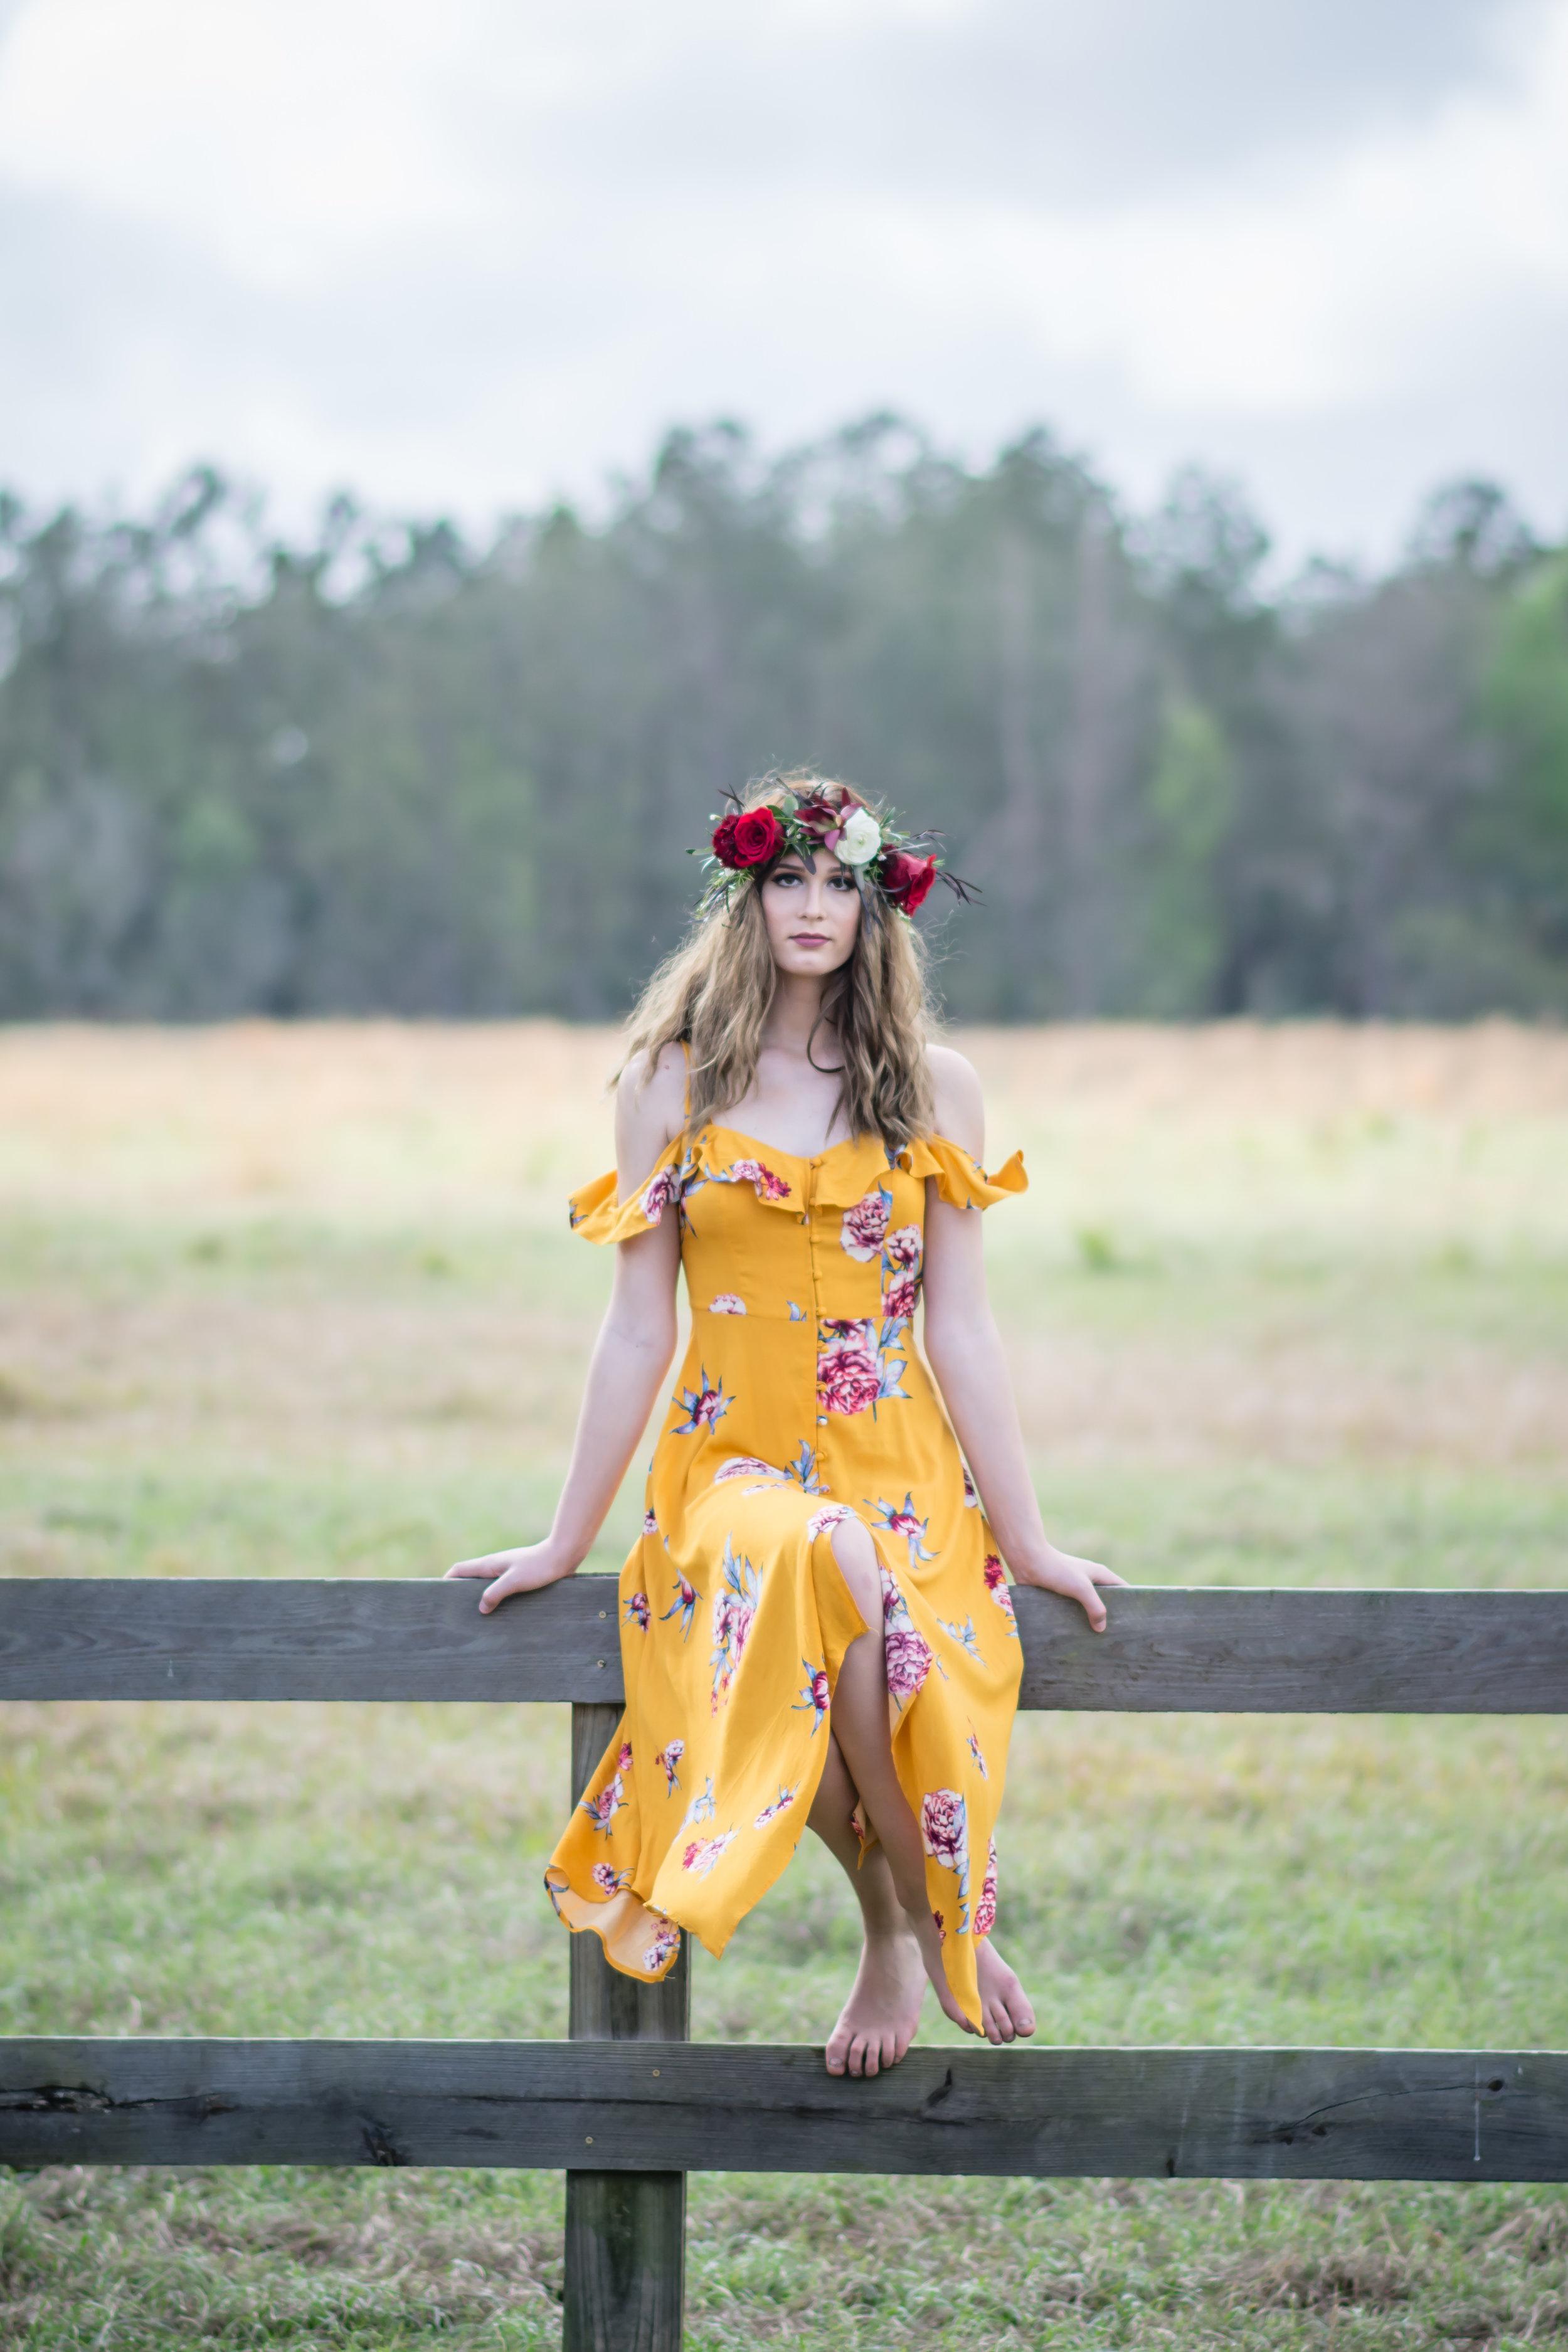 floral-headpiece-fashion-photoshoot-geneva-central-florida-photographer-yanitza-ninett-44.jpg